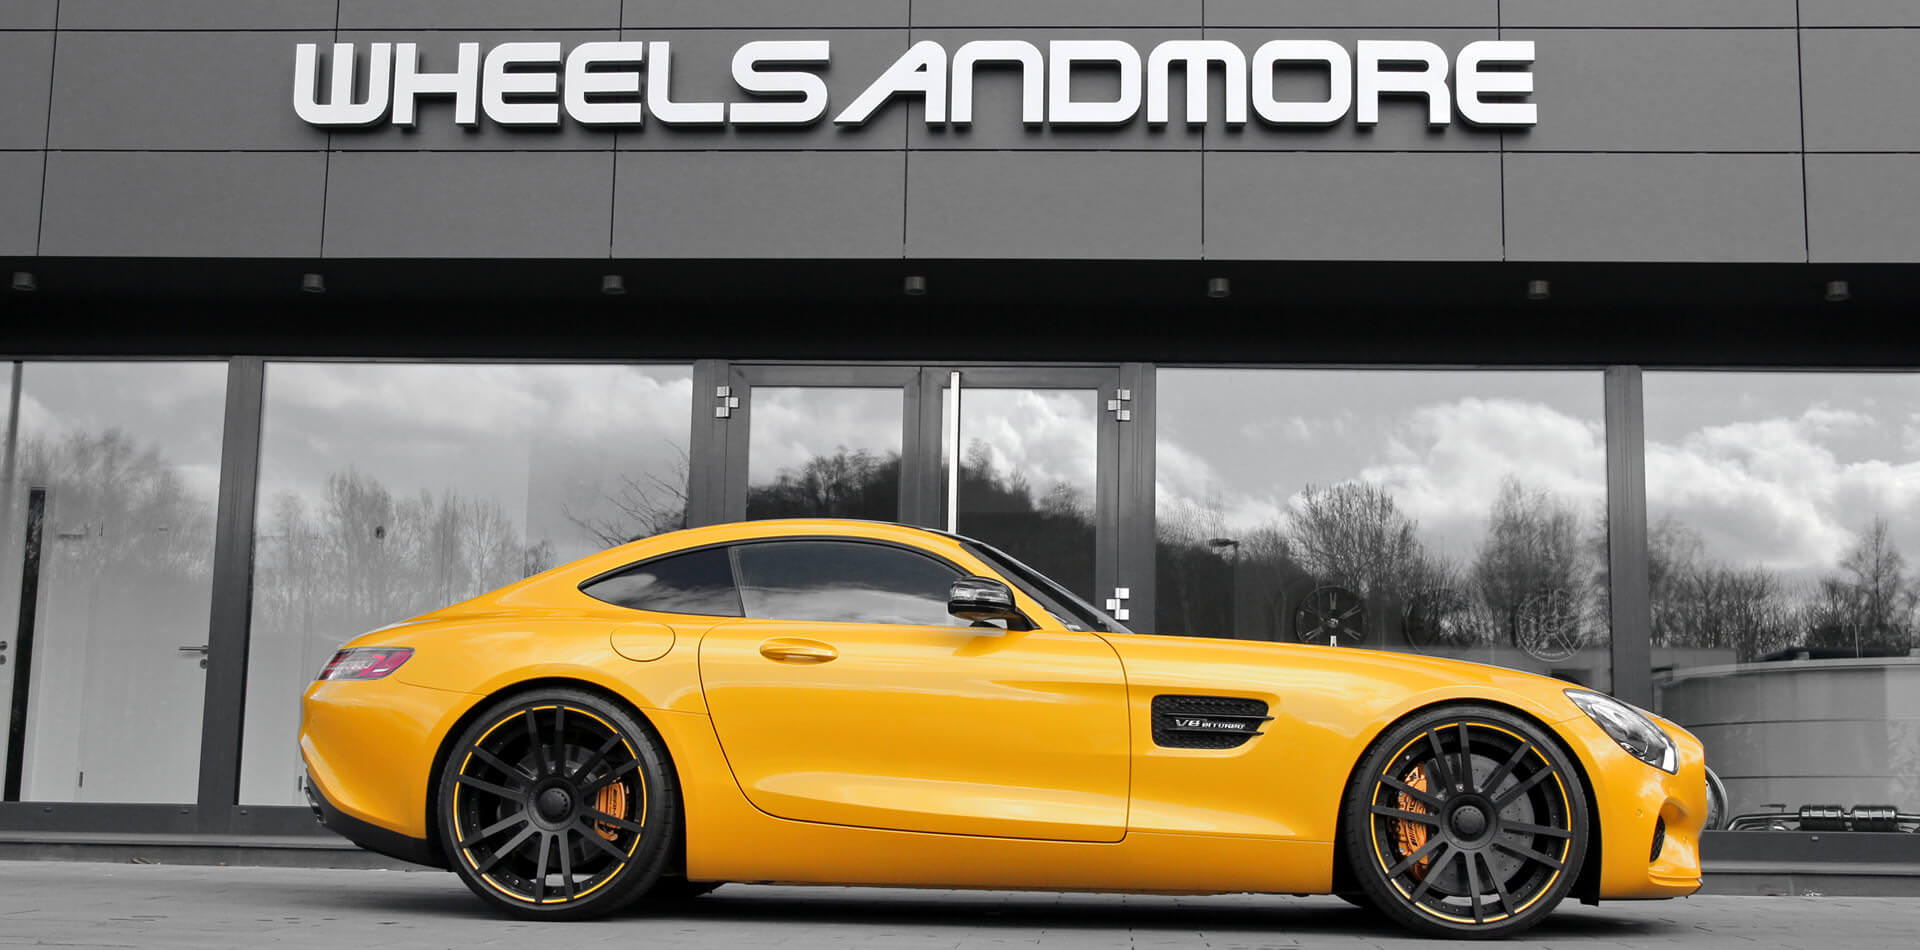 Fahrwerk_Mercedes_GTS_AMG-1